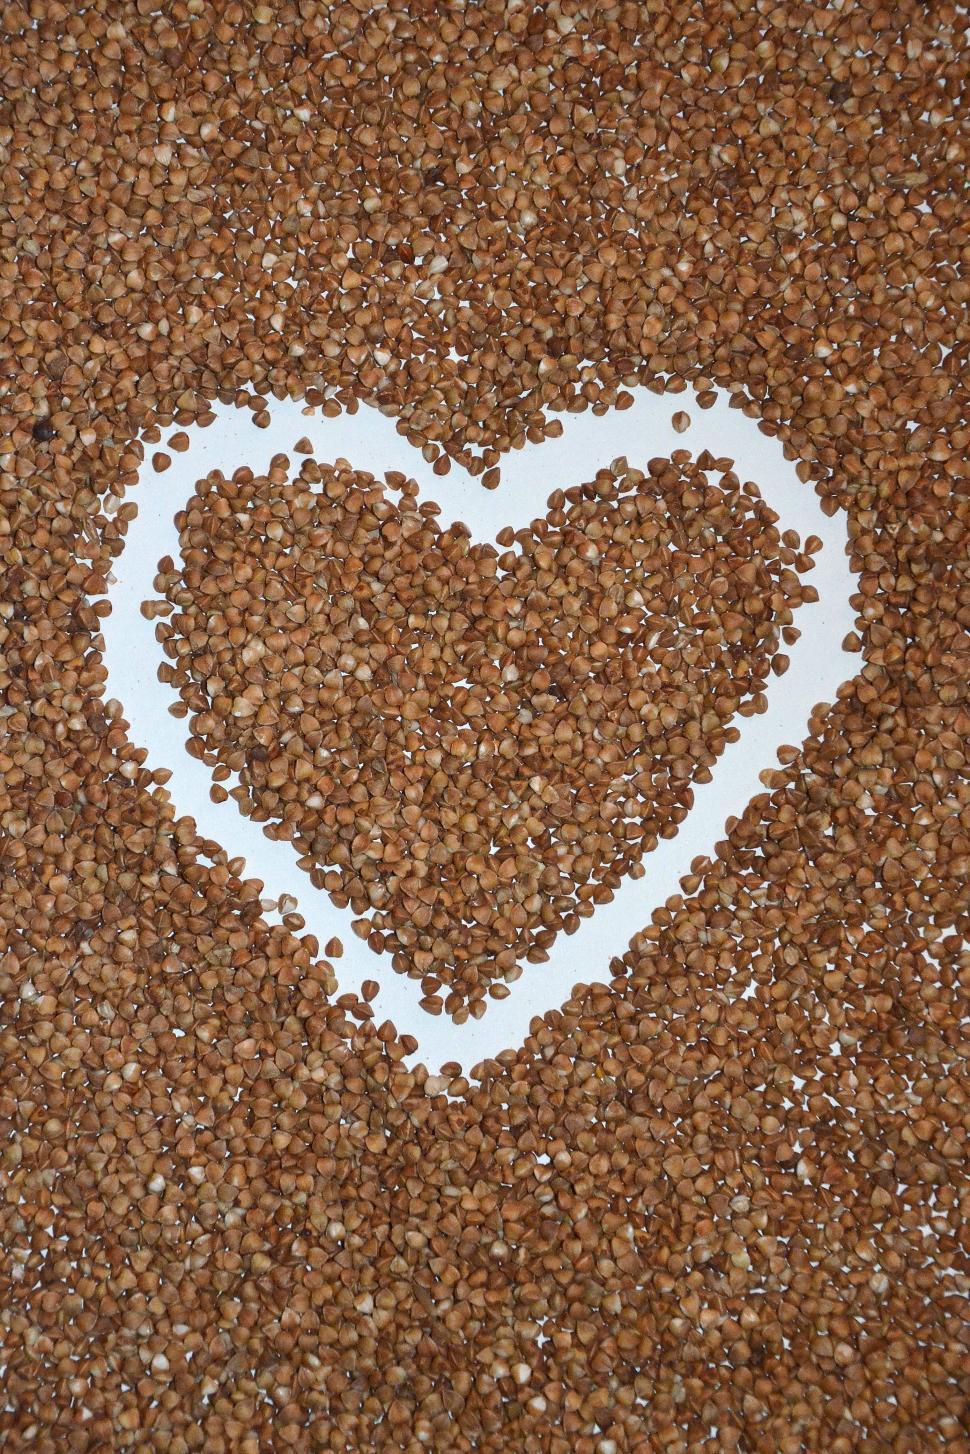 Download Free Stock HD Photo of Buckwheat heart.  Online